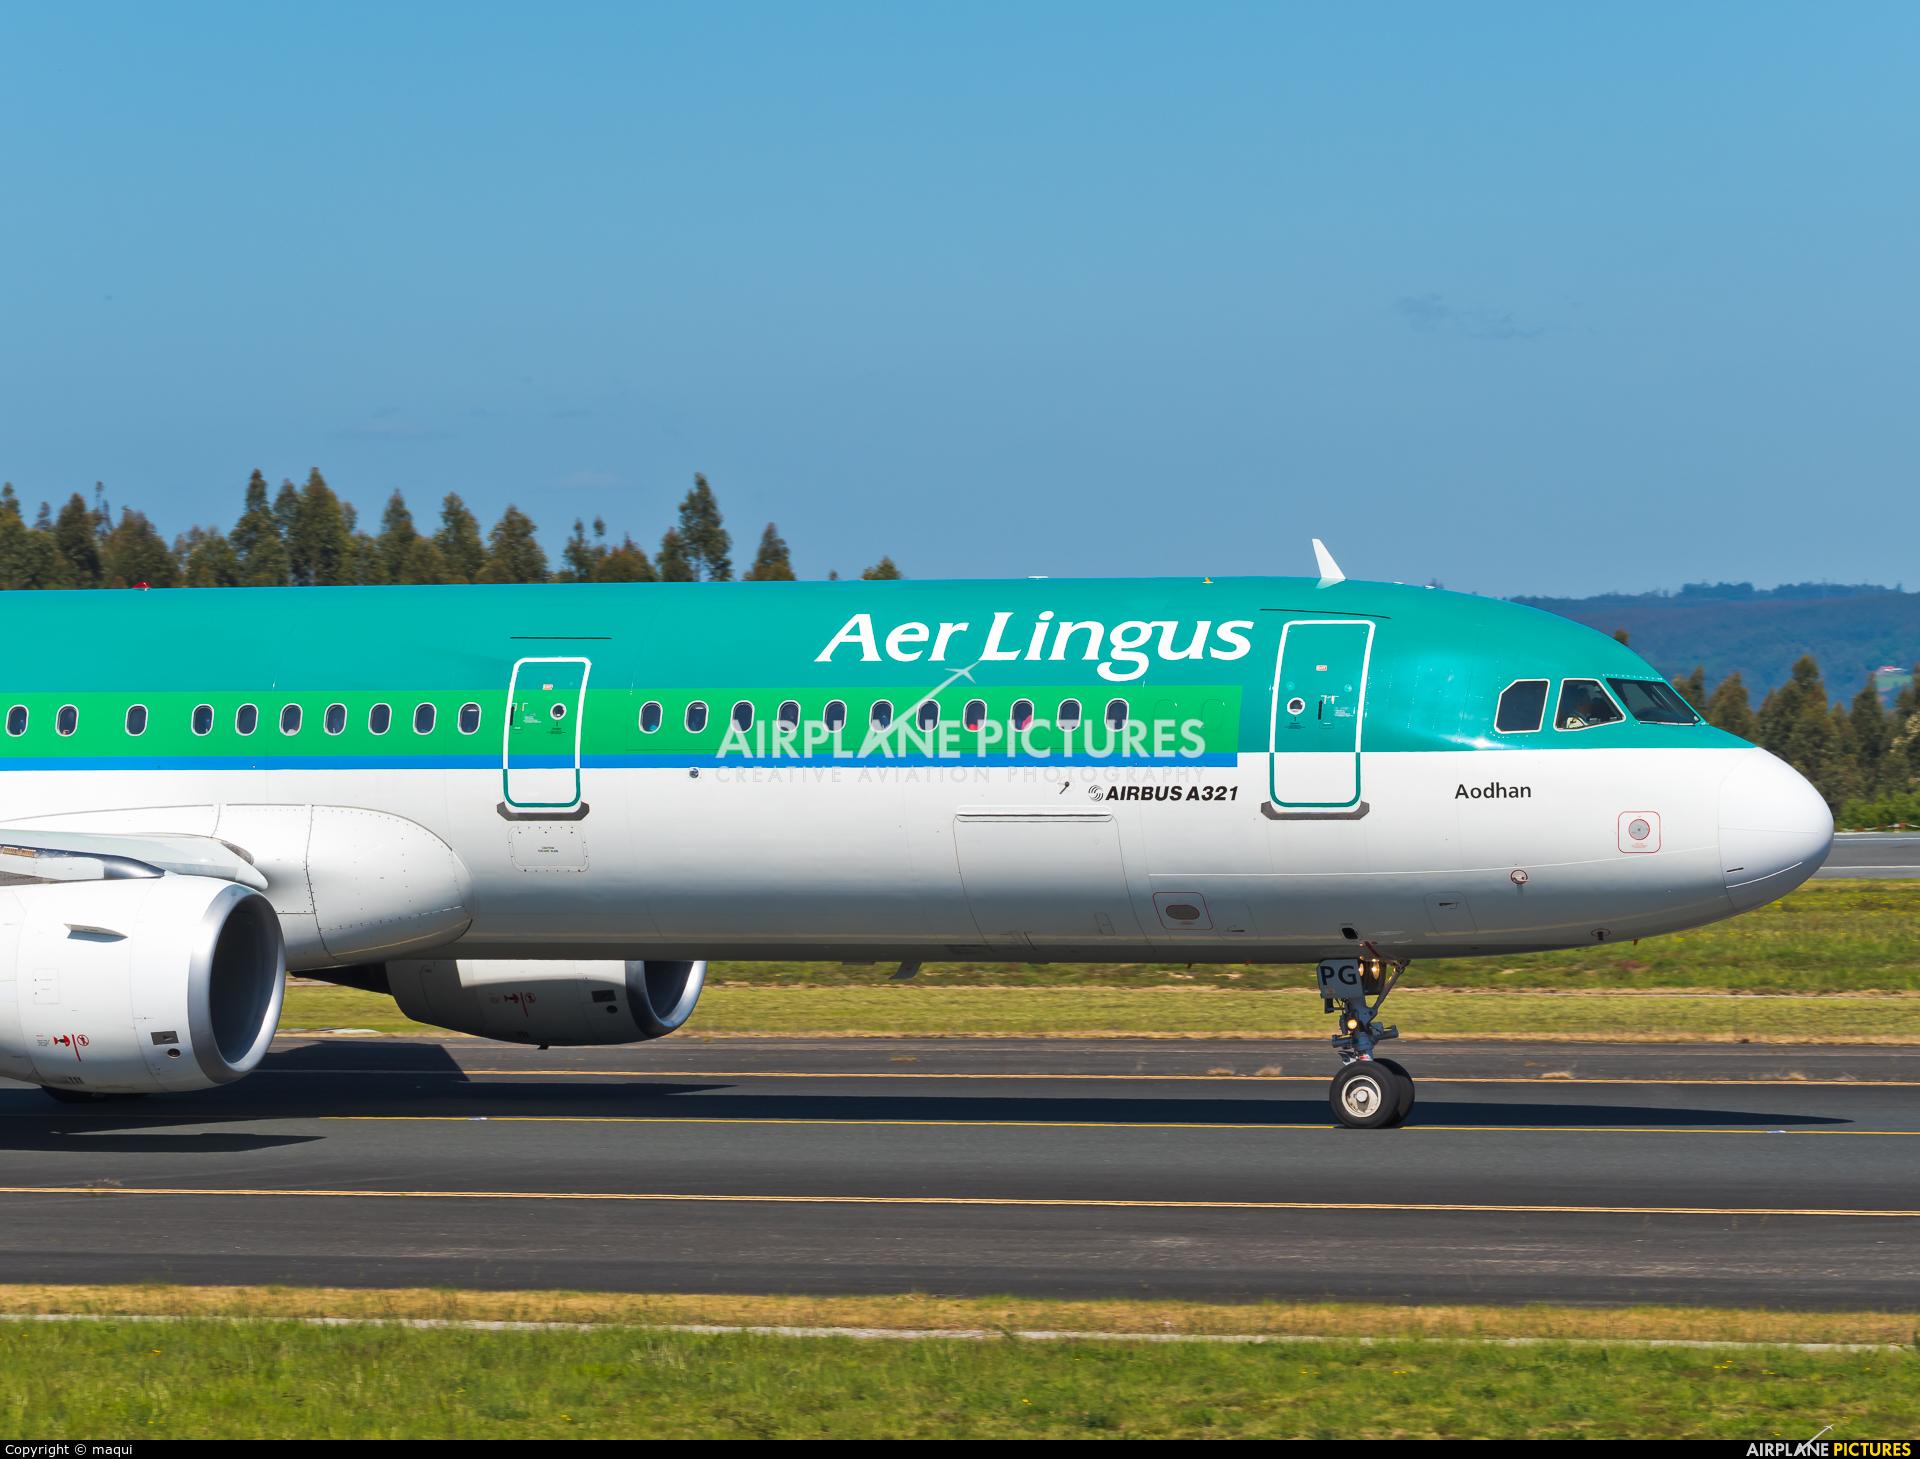 Aer Lingus EI-CPG aircraft at Santiago de Compostela